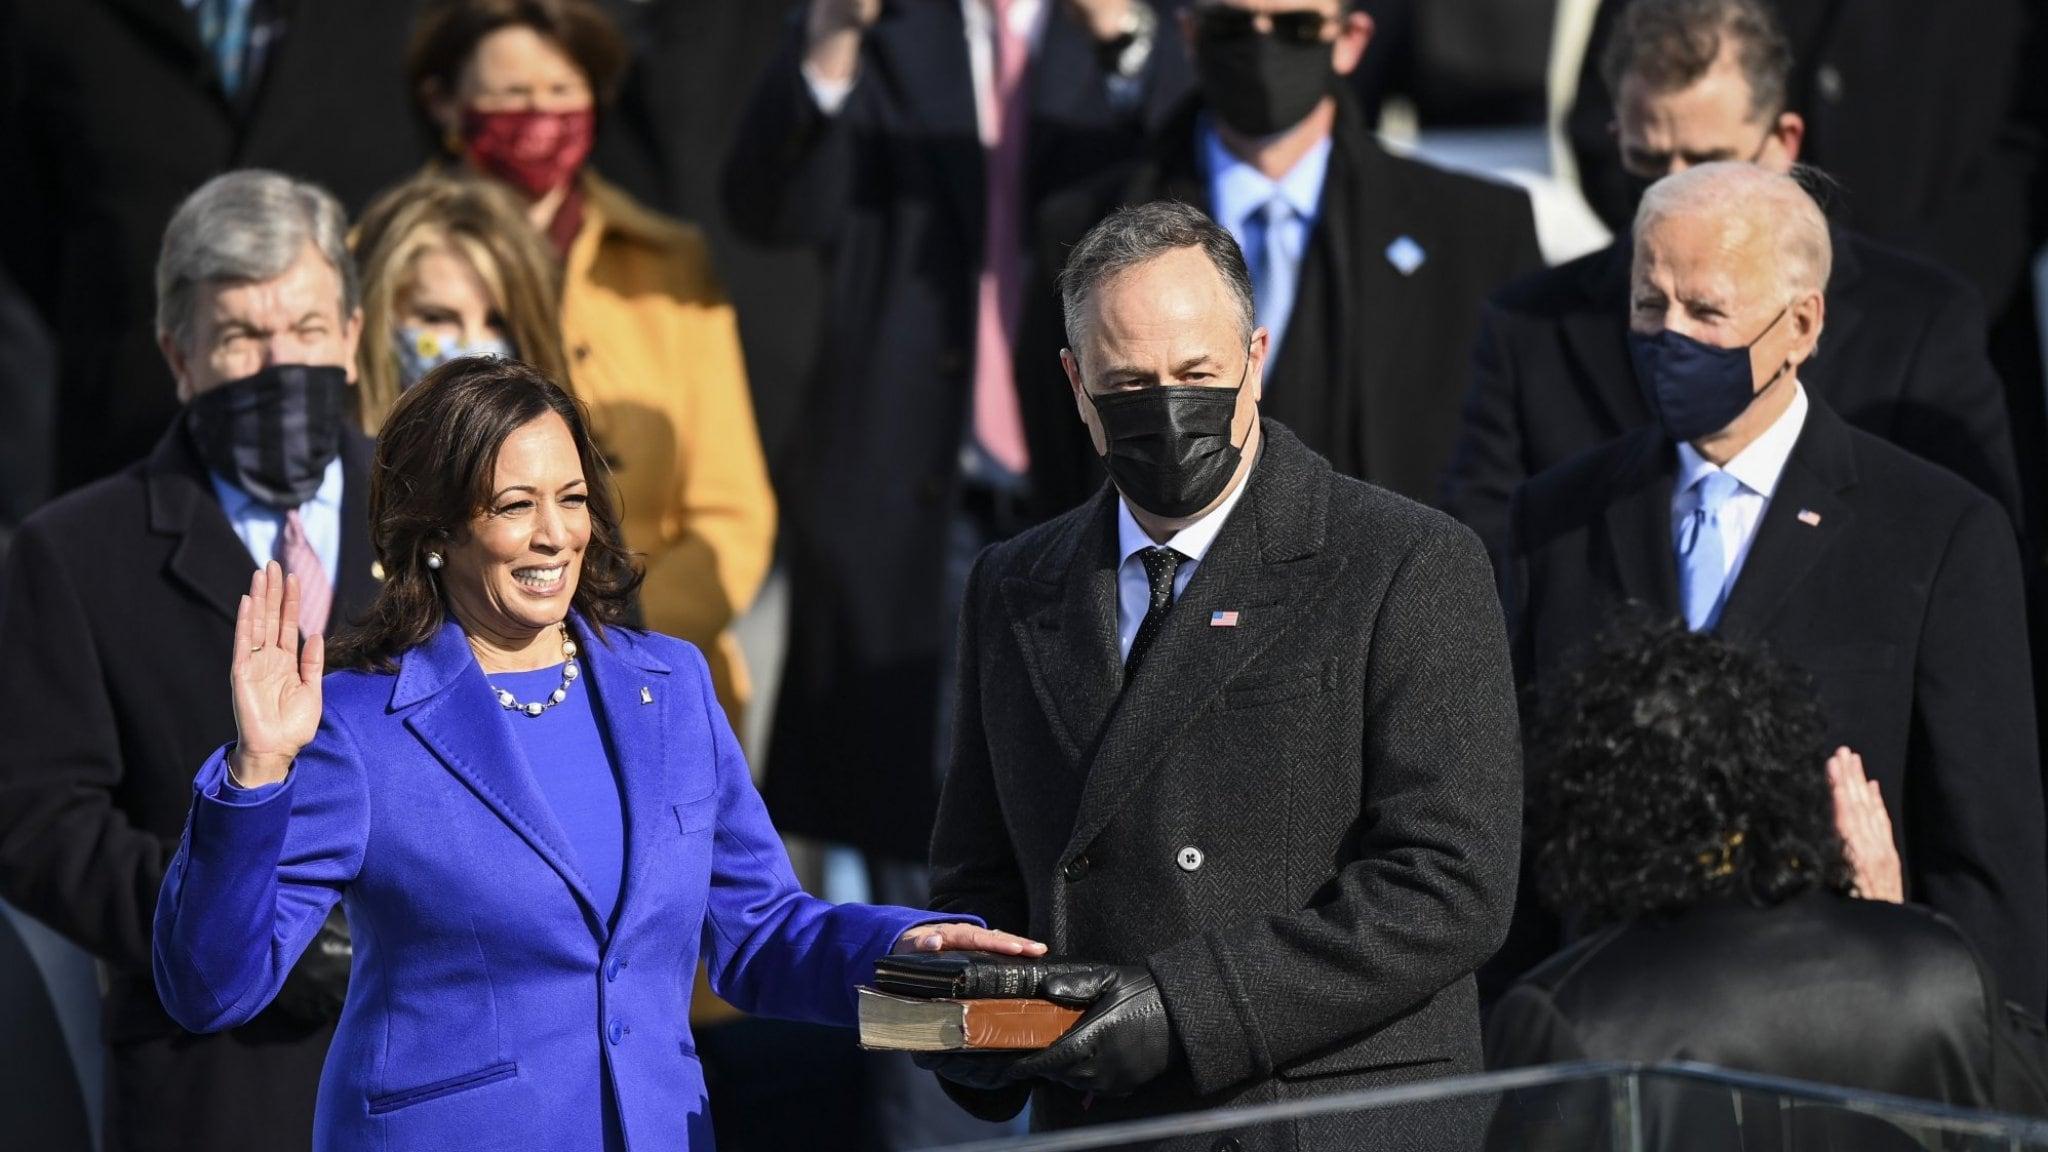 The powerful message behind Kamala Harris' inauguration appearance